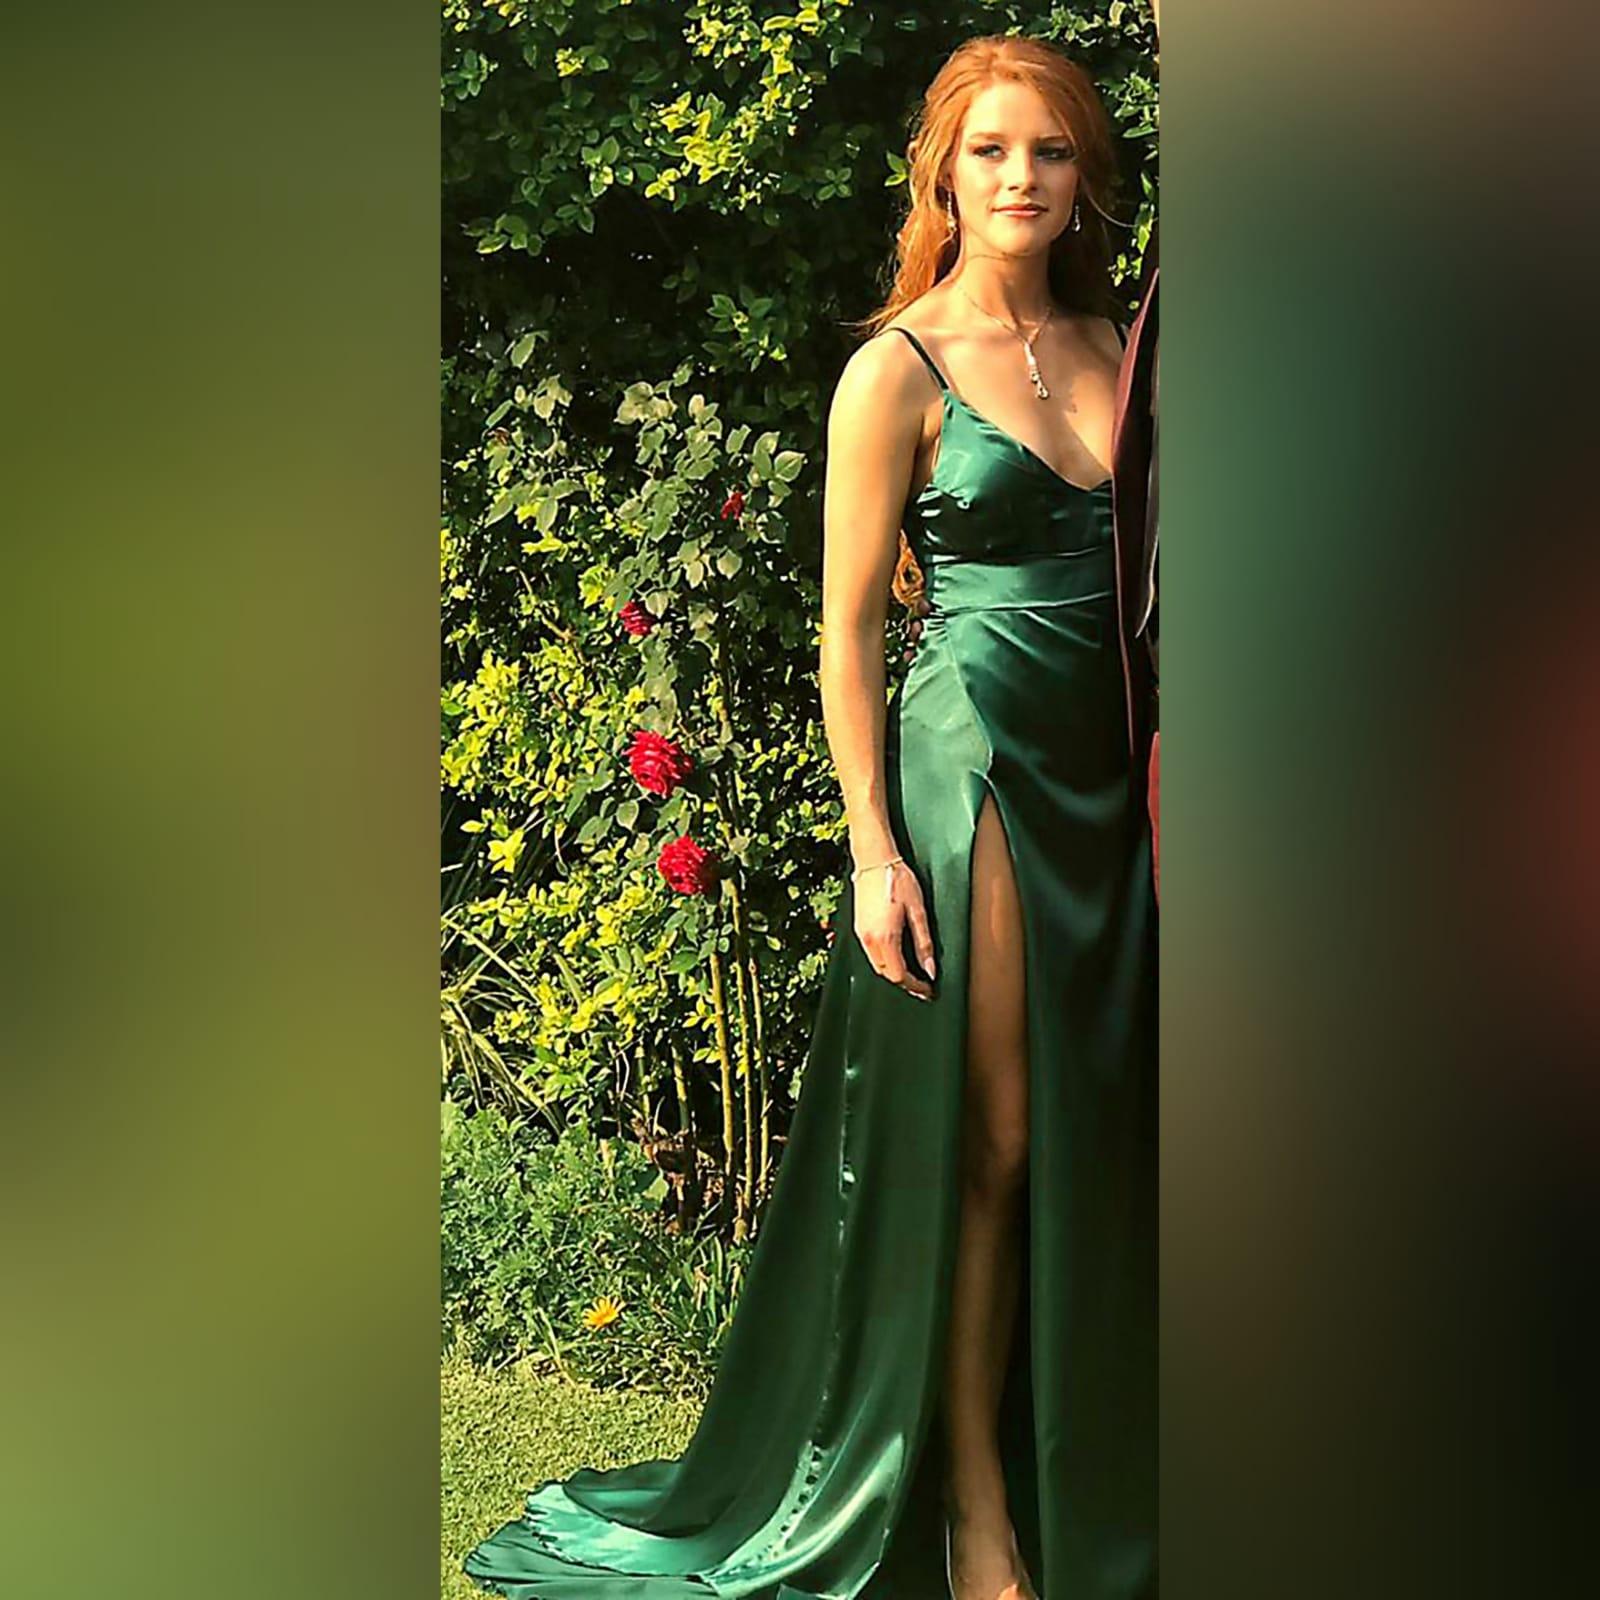 Emerald green long satin prom dress 3 emerald green long satin prom dress. With a high crossed slit and a train.